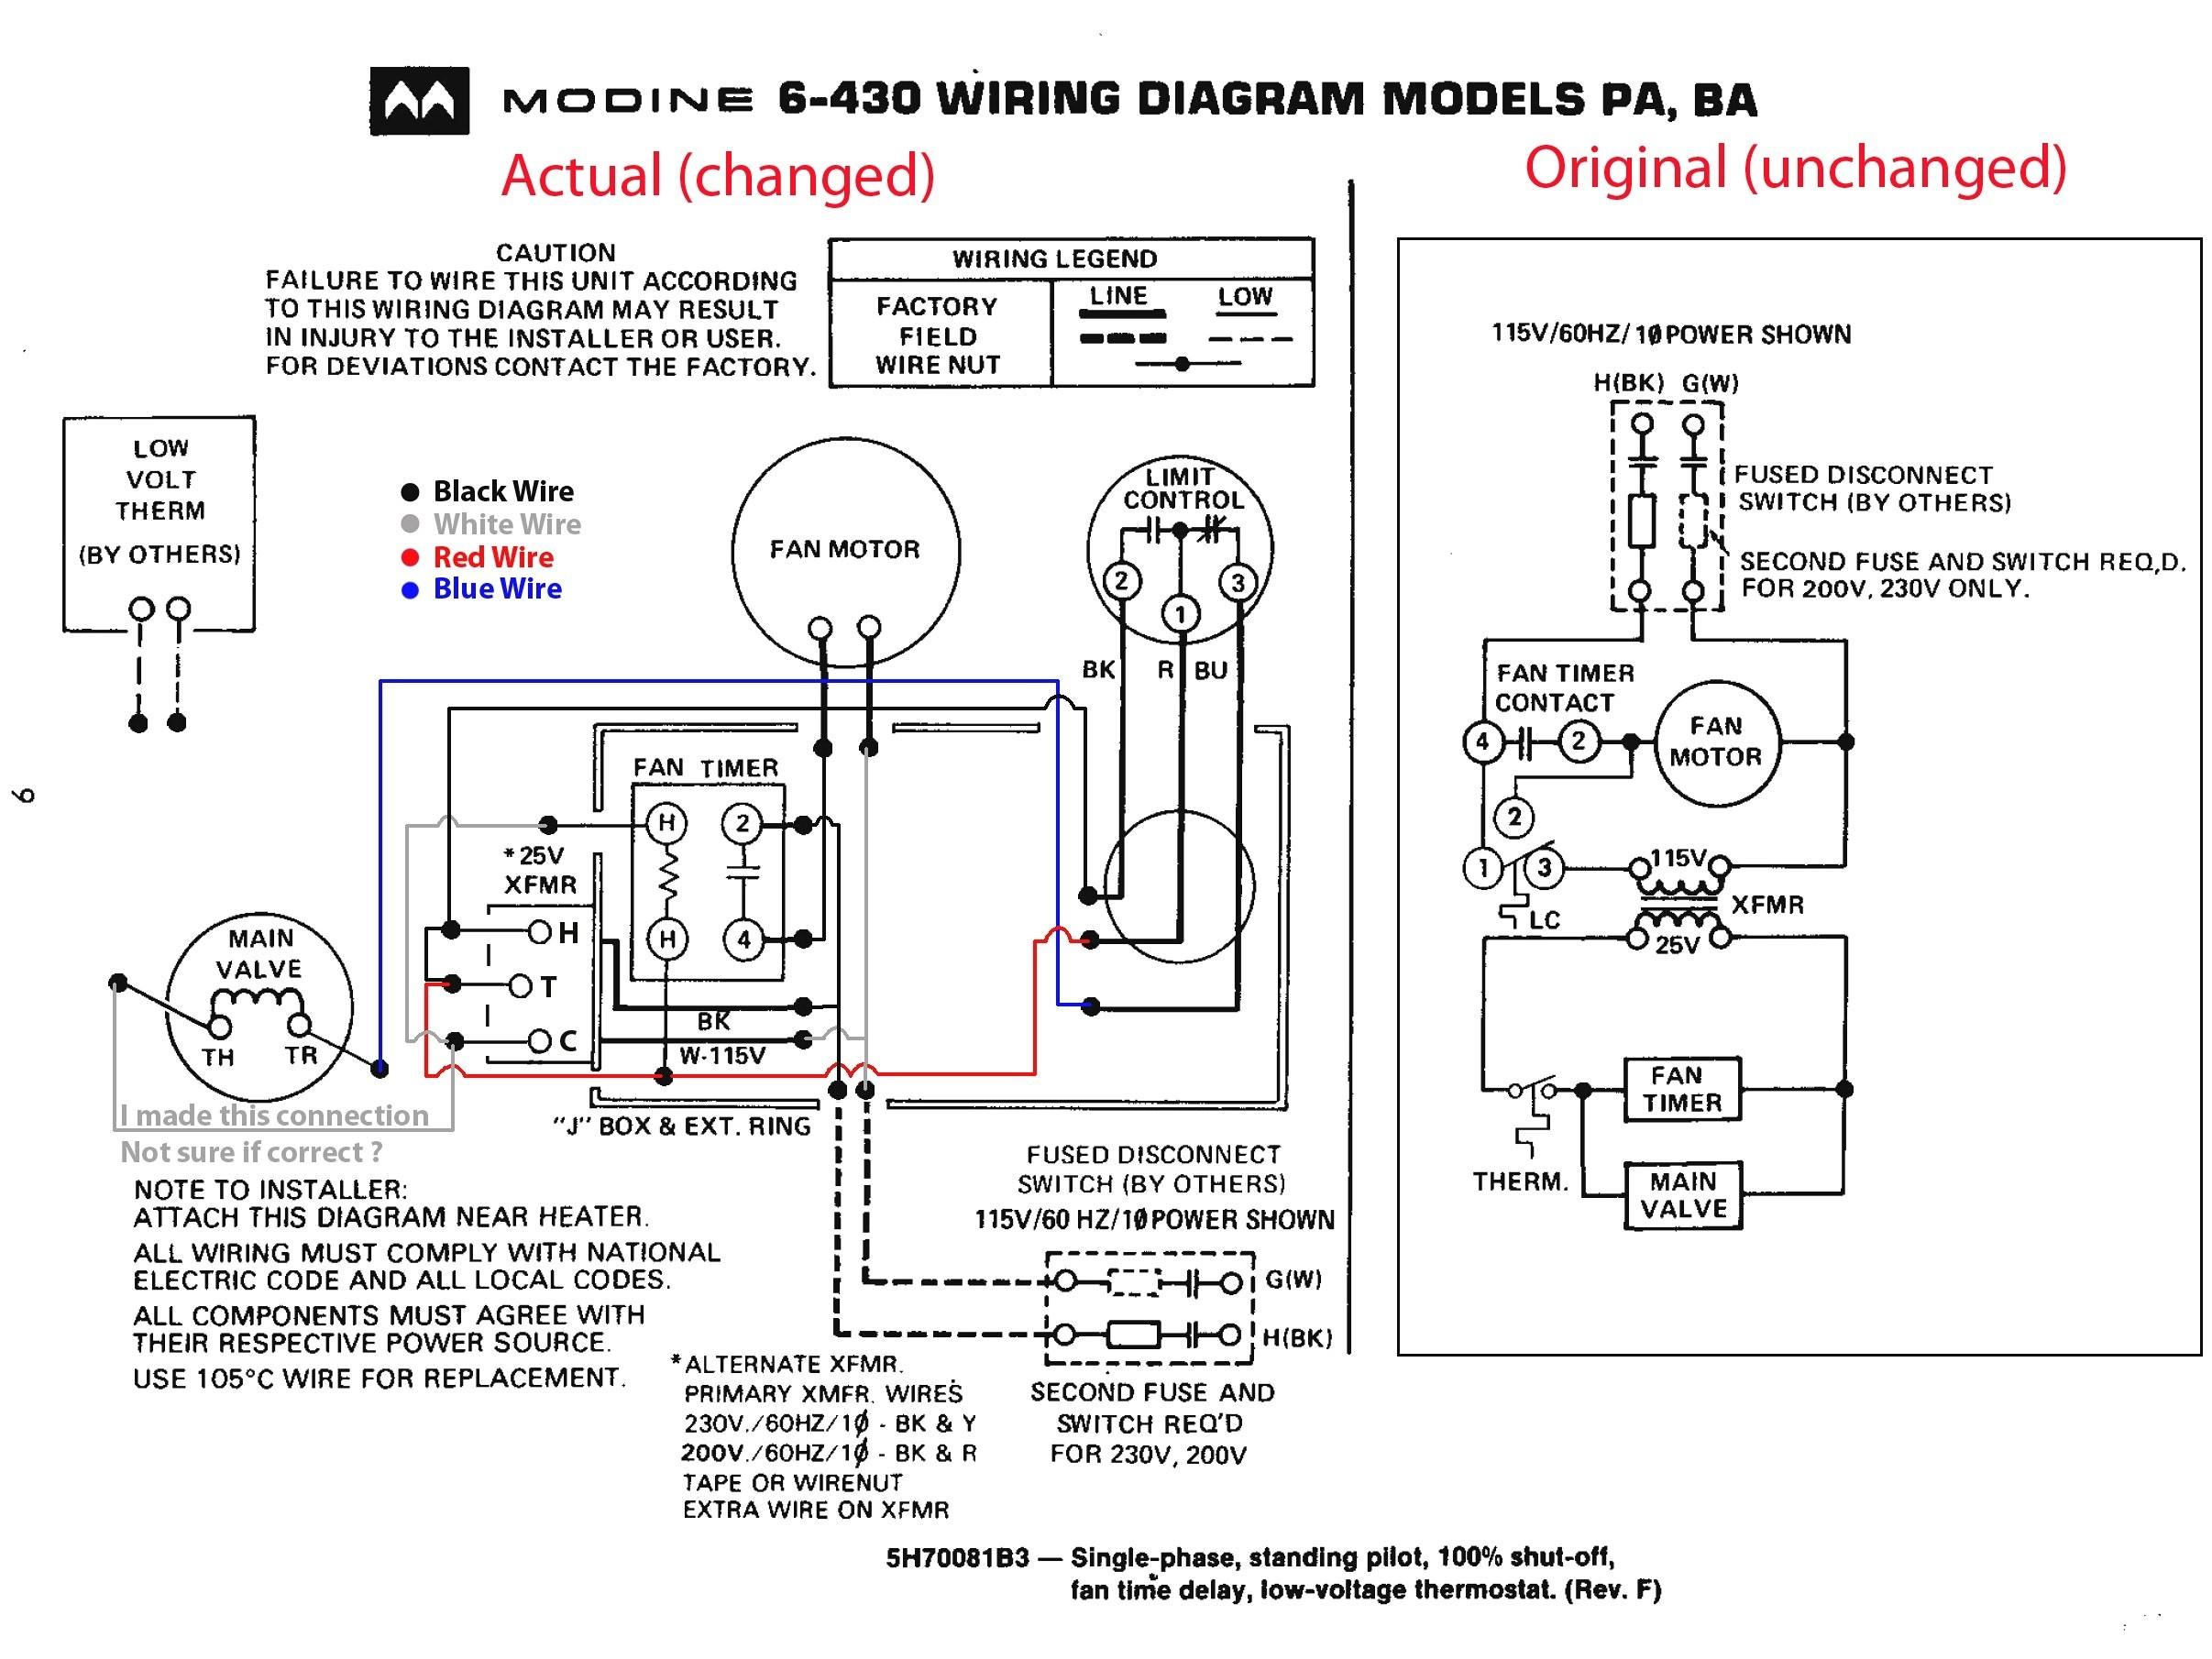 furnace wiring diagram model pa300a wiring diagram Four-Wire Thermostat Wiring Diagram janitrol furnace wiring diagram 17 1 learntolead co \\u2022heil furnace wiring schematic diagram rh 199